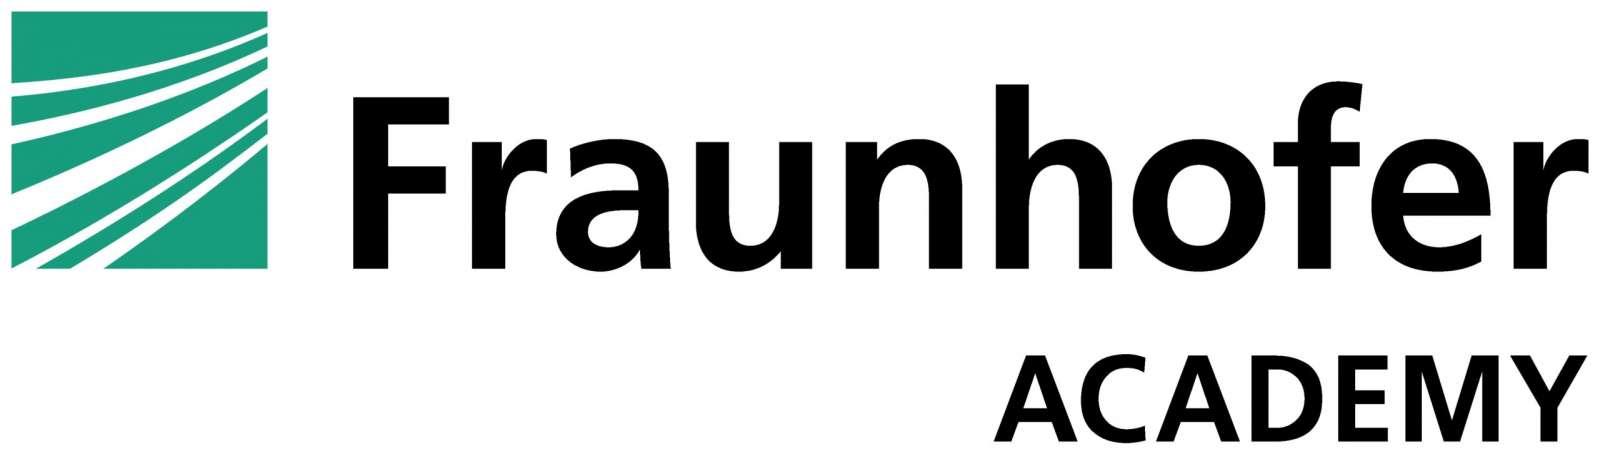 Fraunhofee Academy